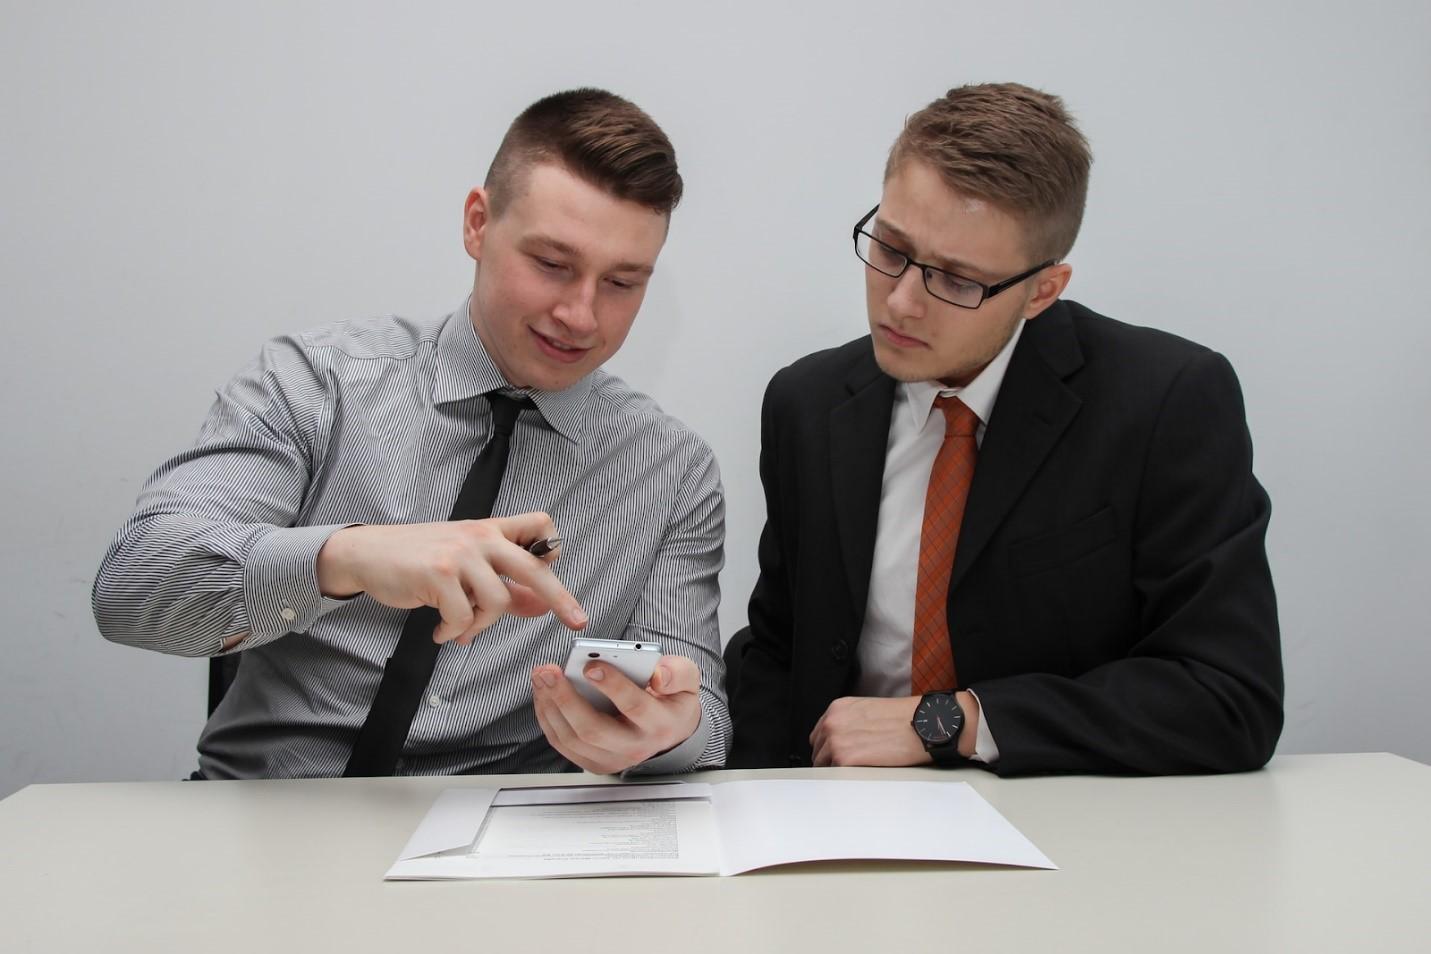 Examining a cash flow statement with ZarMoney